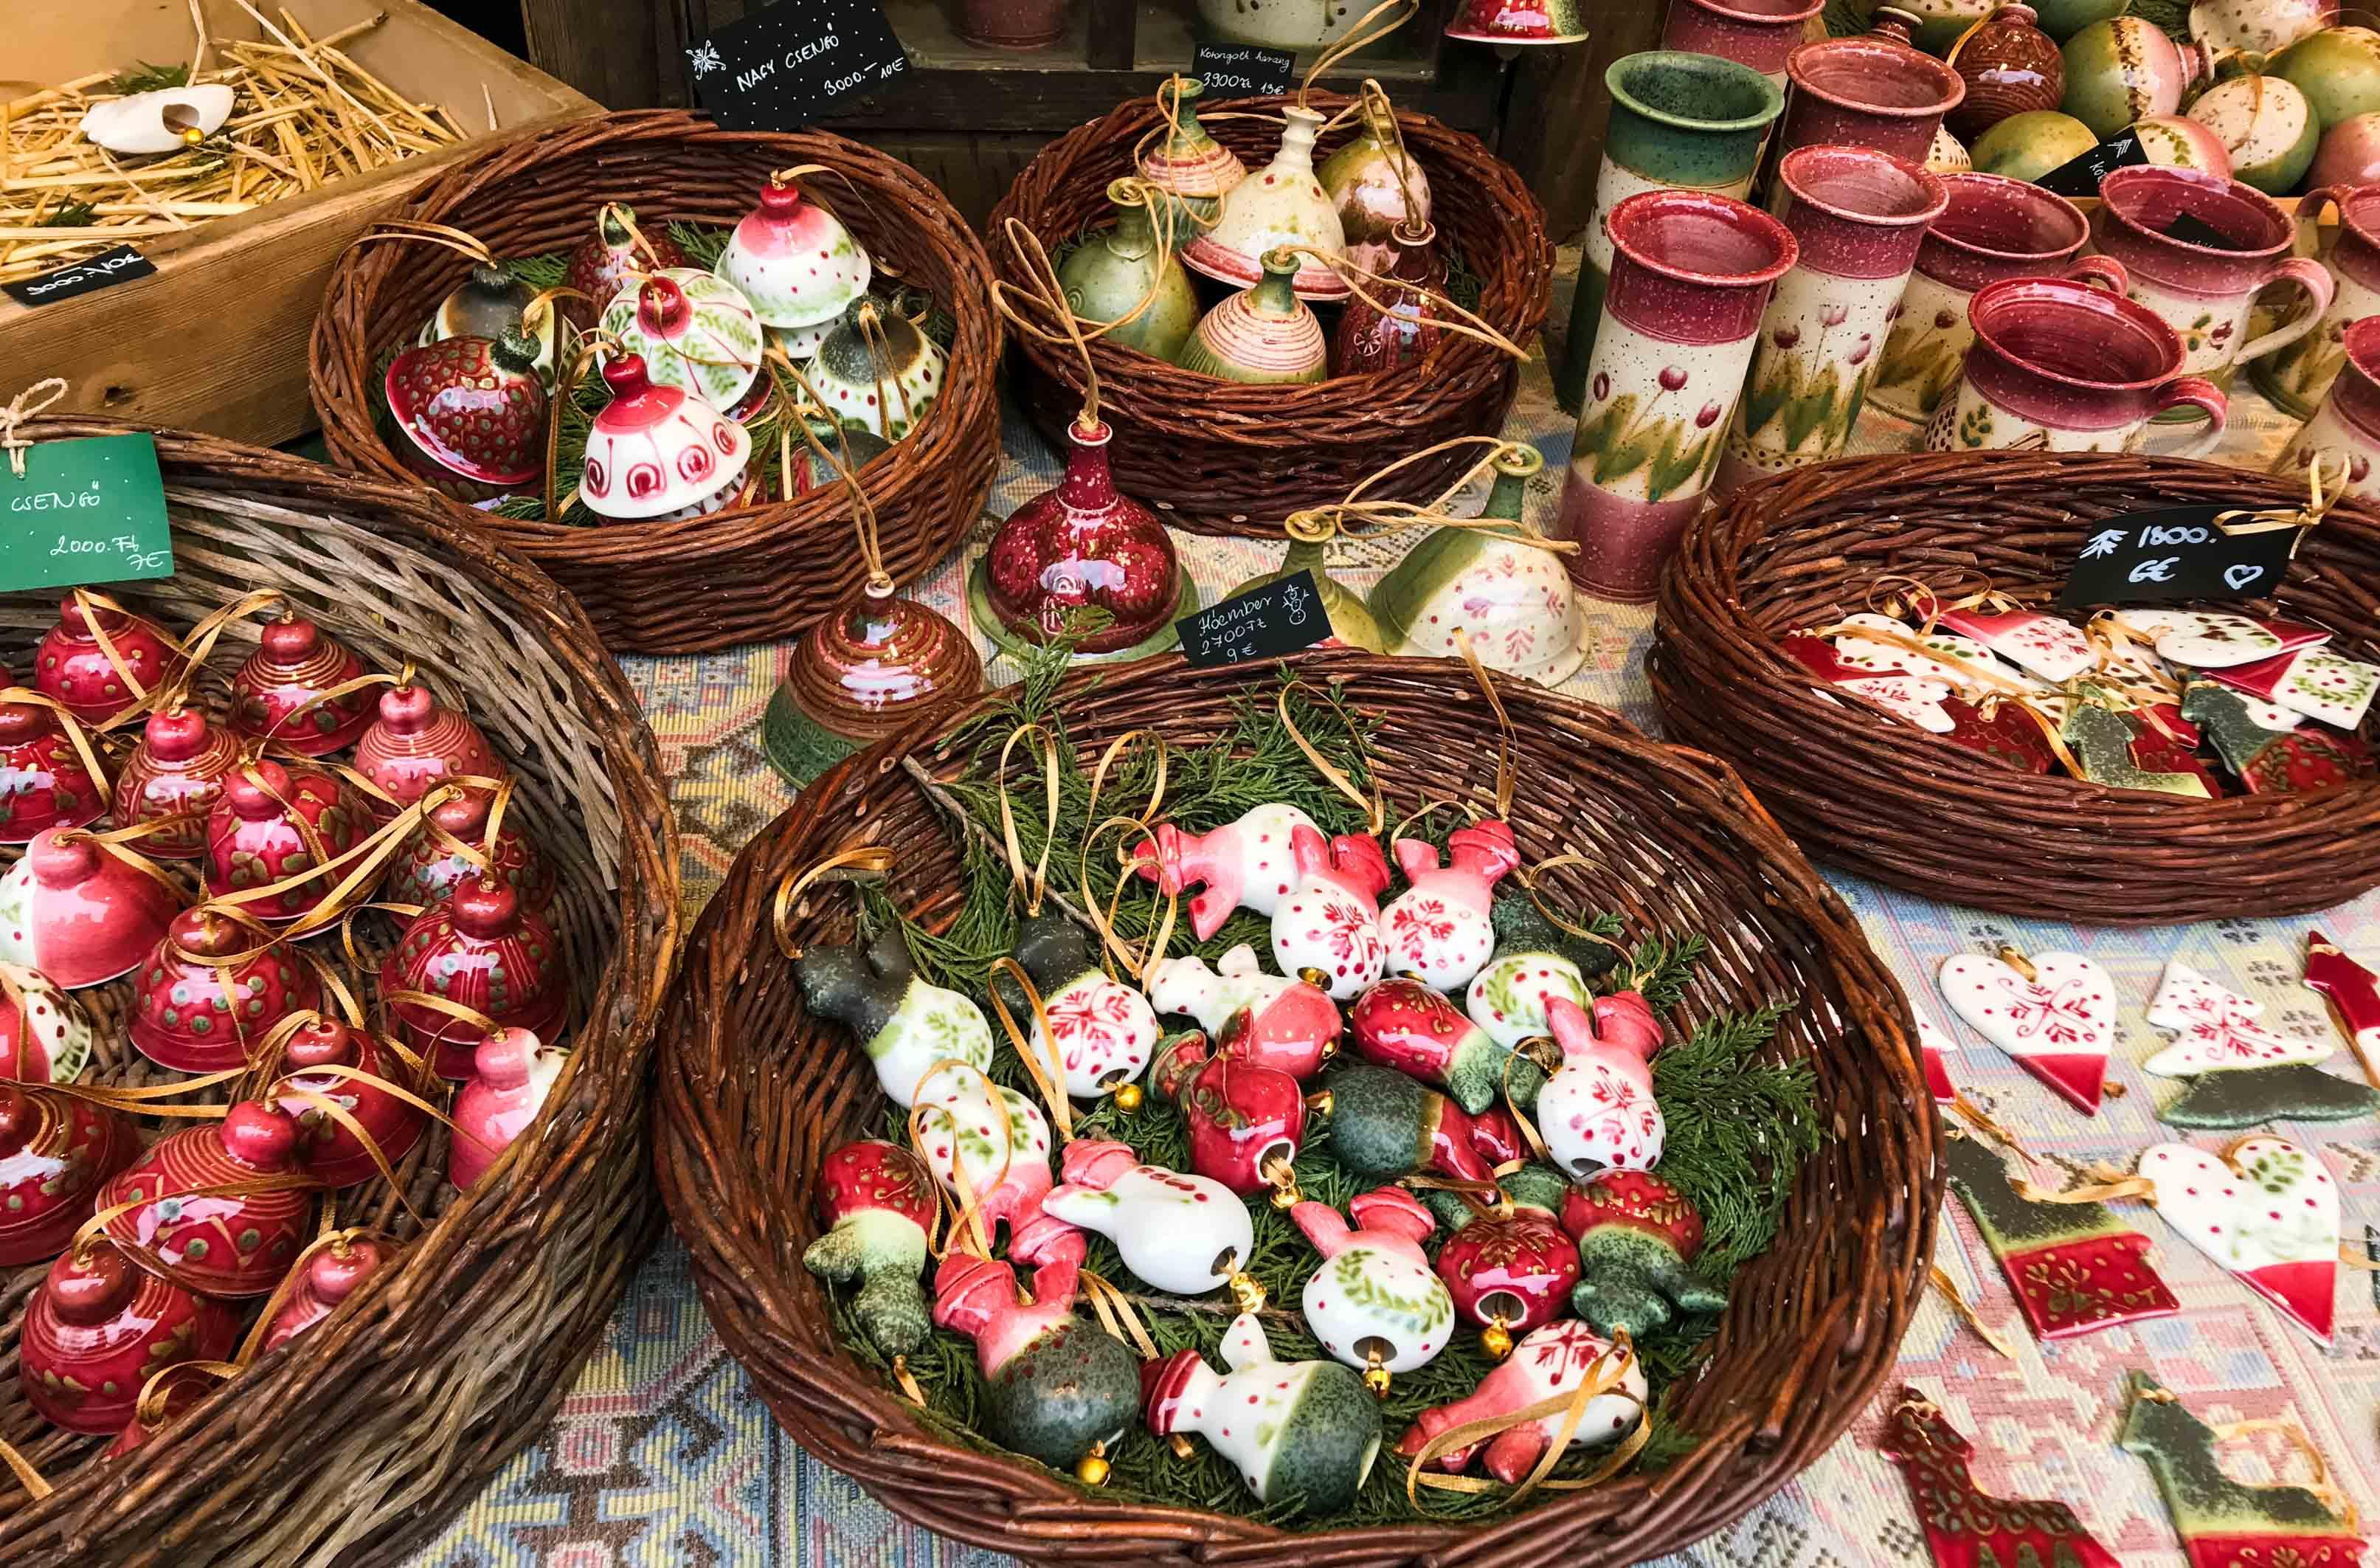 Ёлочные игрушки на рождественском рынке Будапешта